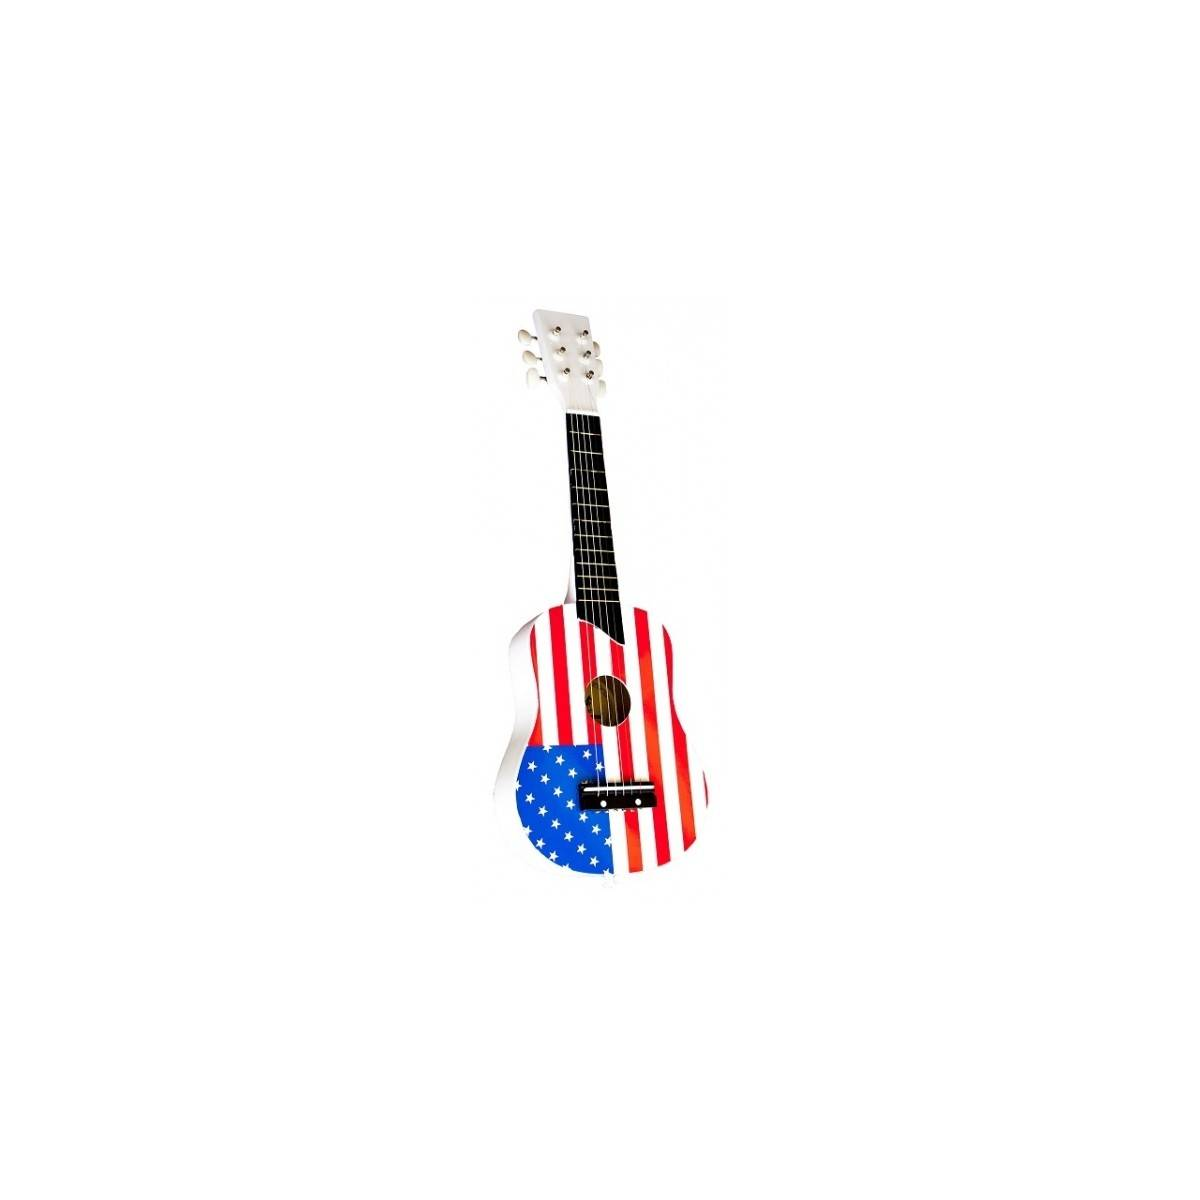 Guitare jouet Deluxe USA